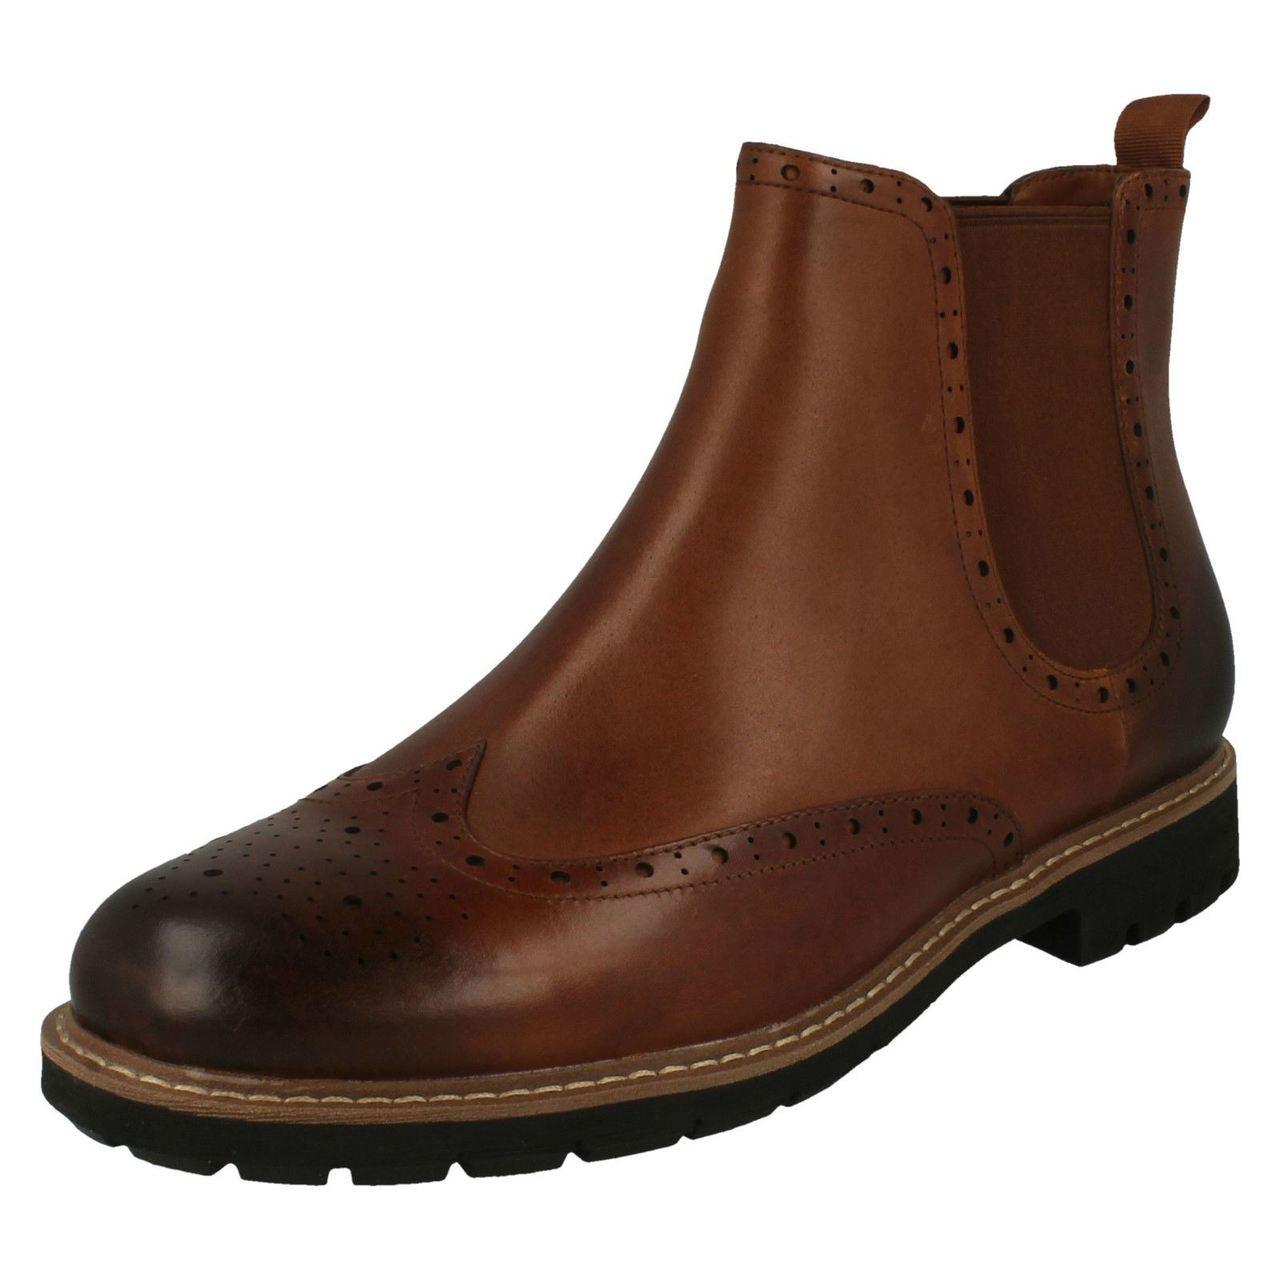 Mens Clarks Smart Chelsea Boots